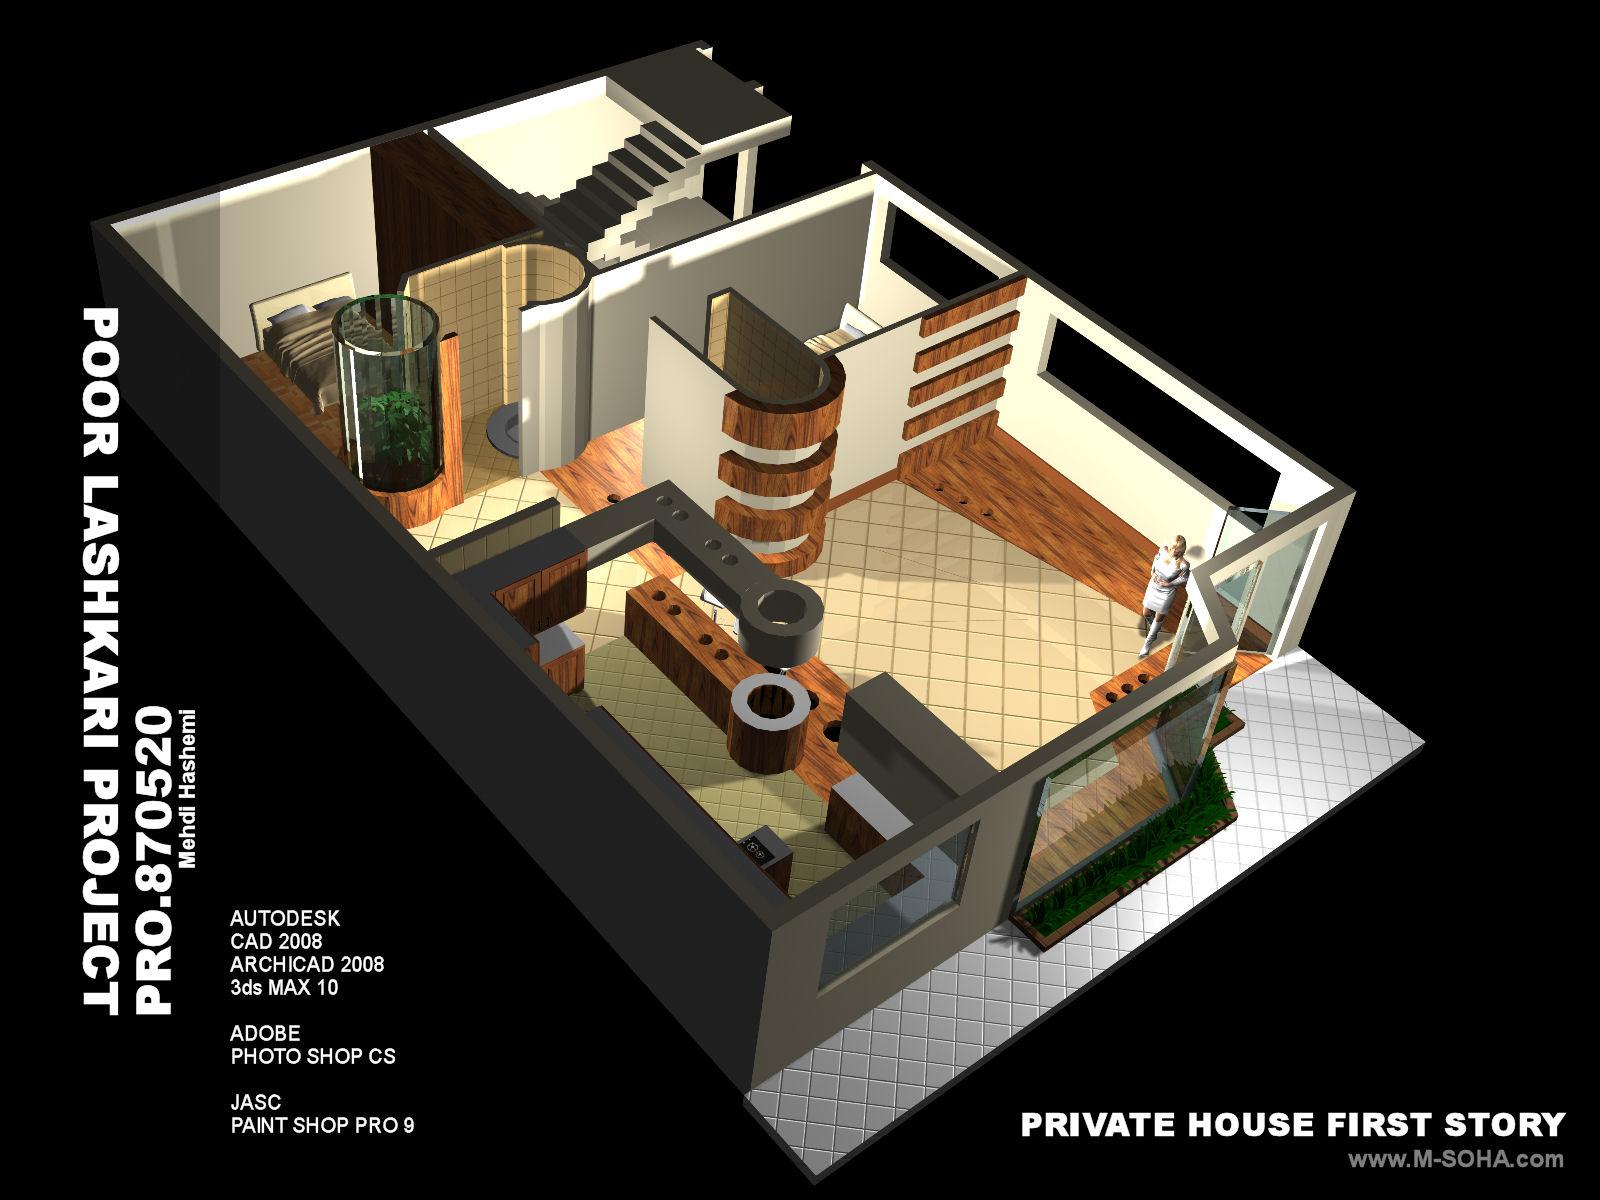 Islamic House Architecture Design – Idea Home And House